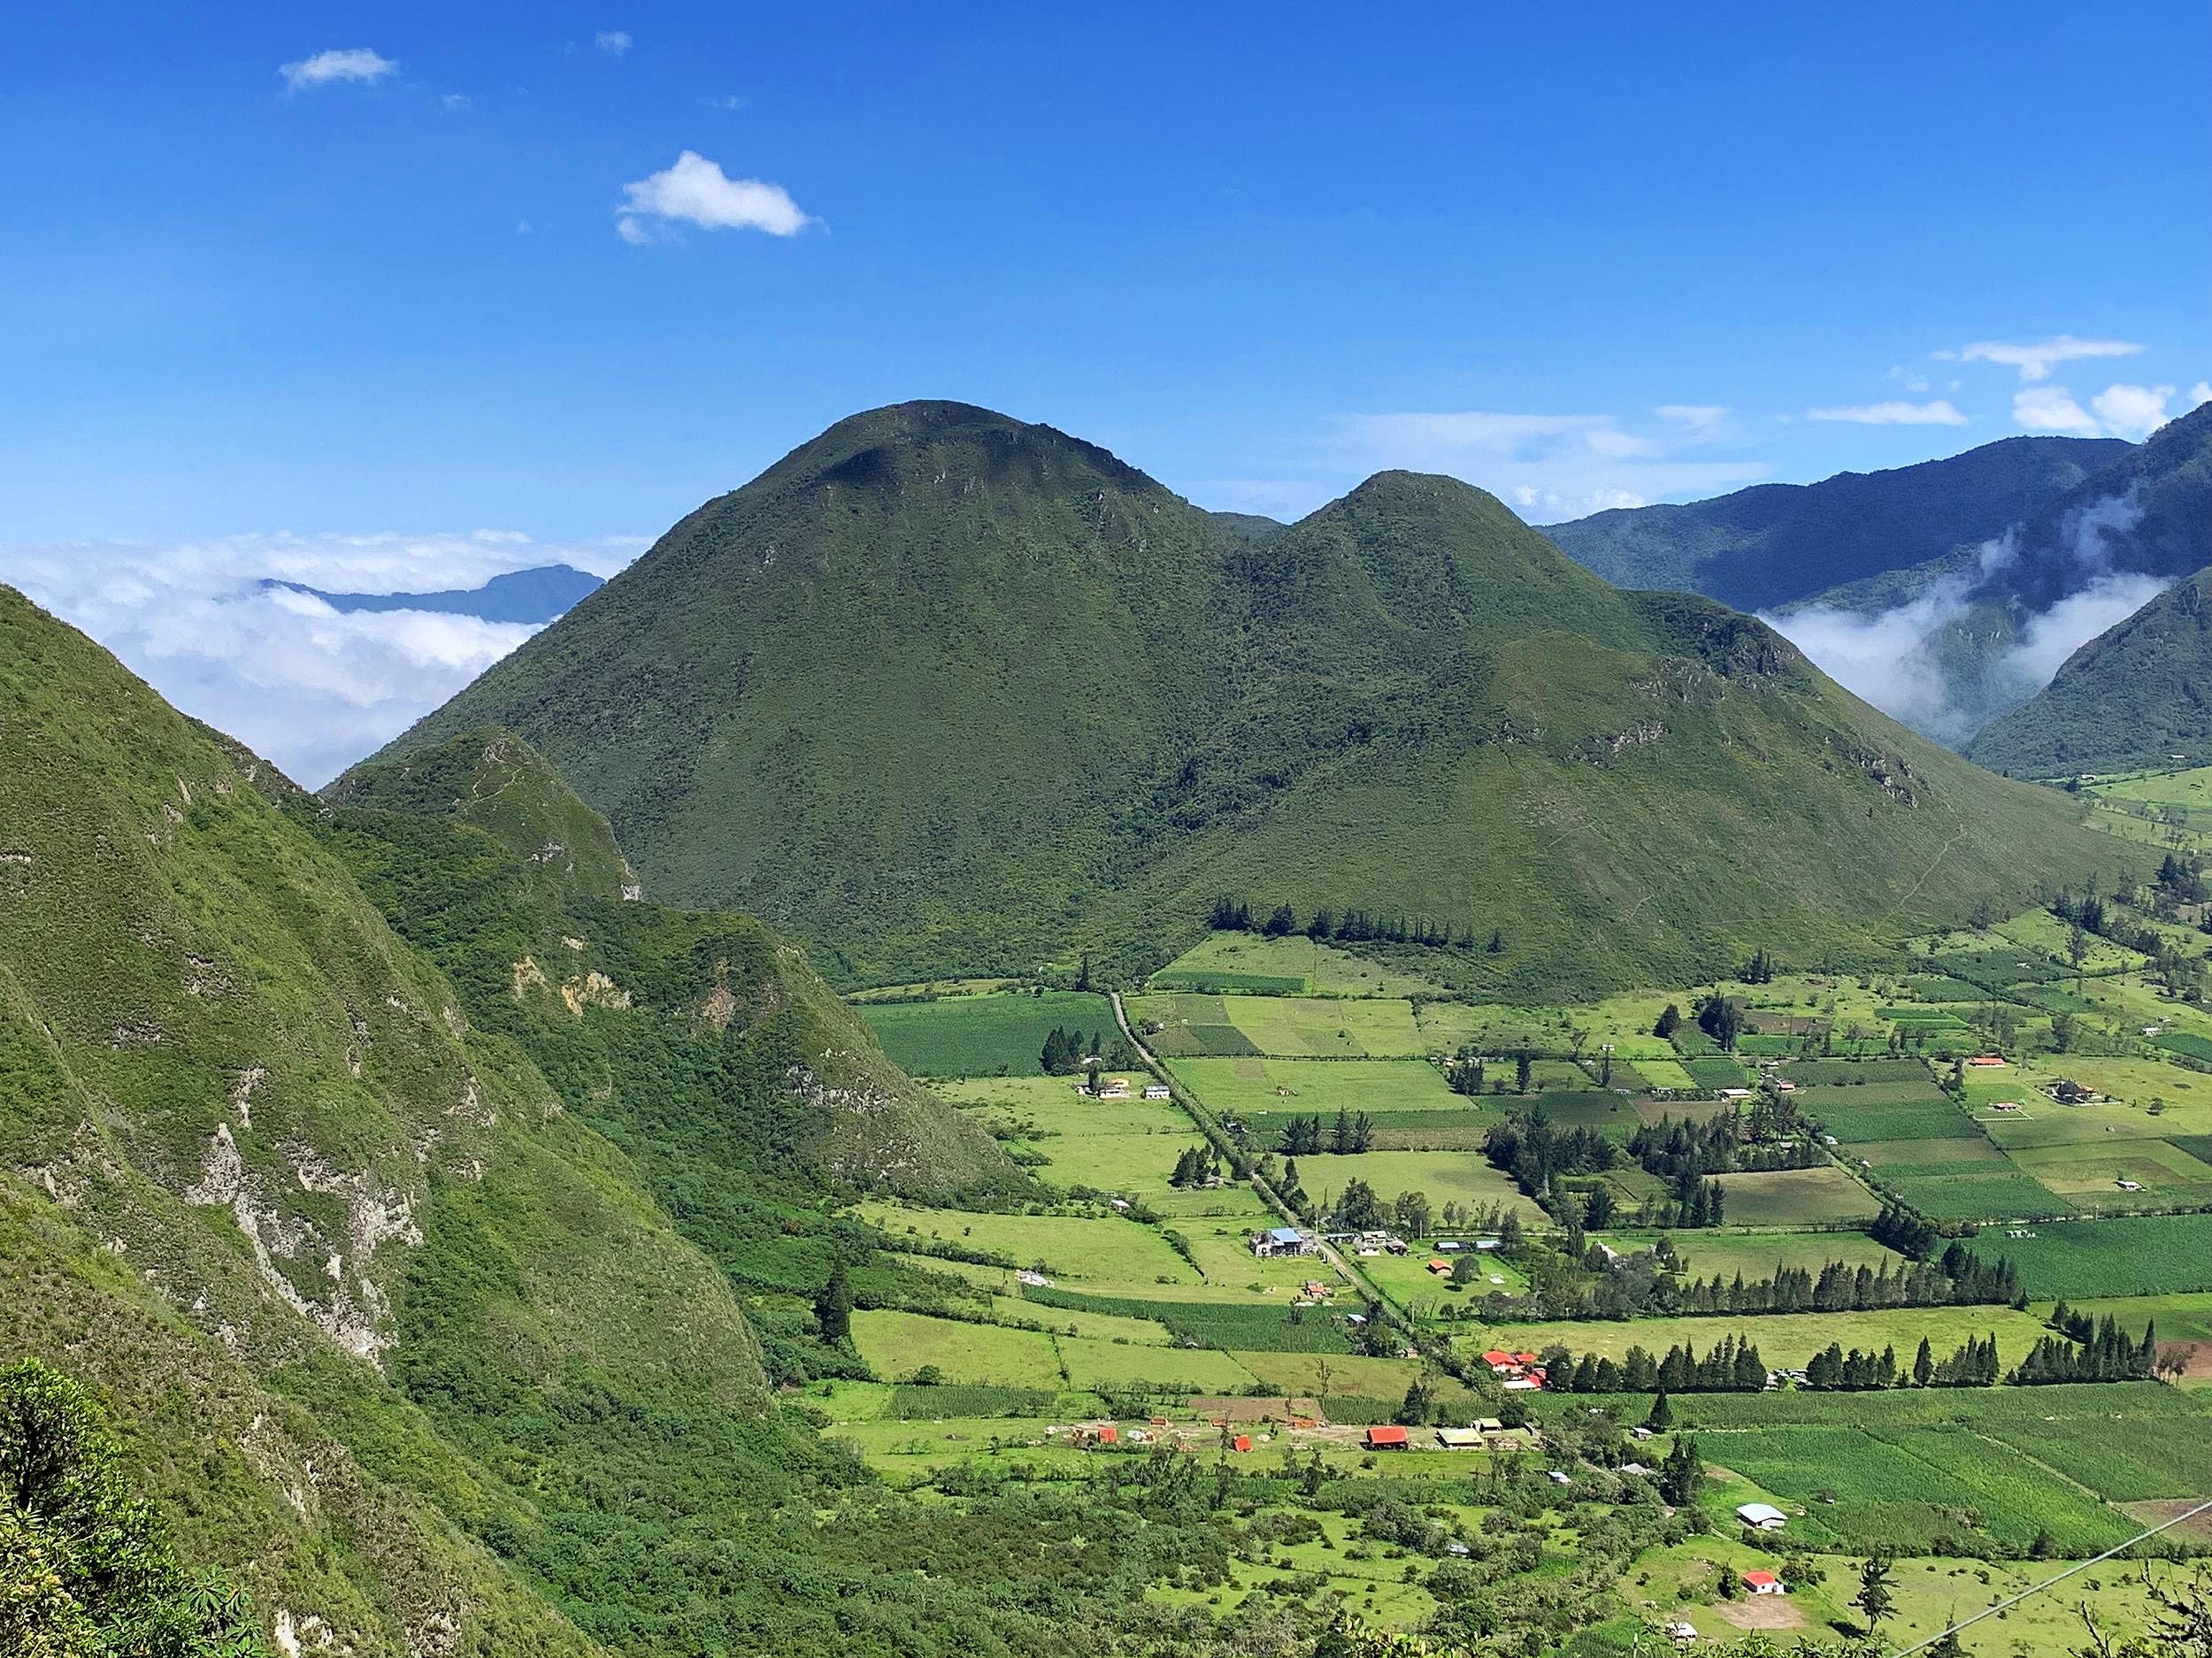 Pululahua Geobotanical Reserve volcanic crater.